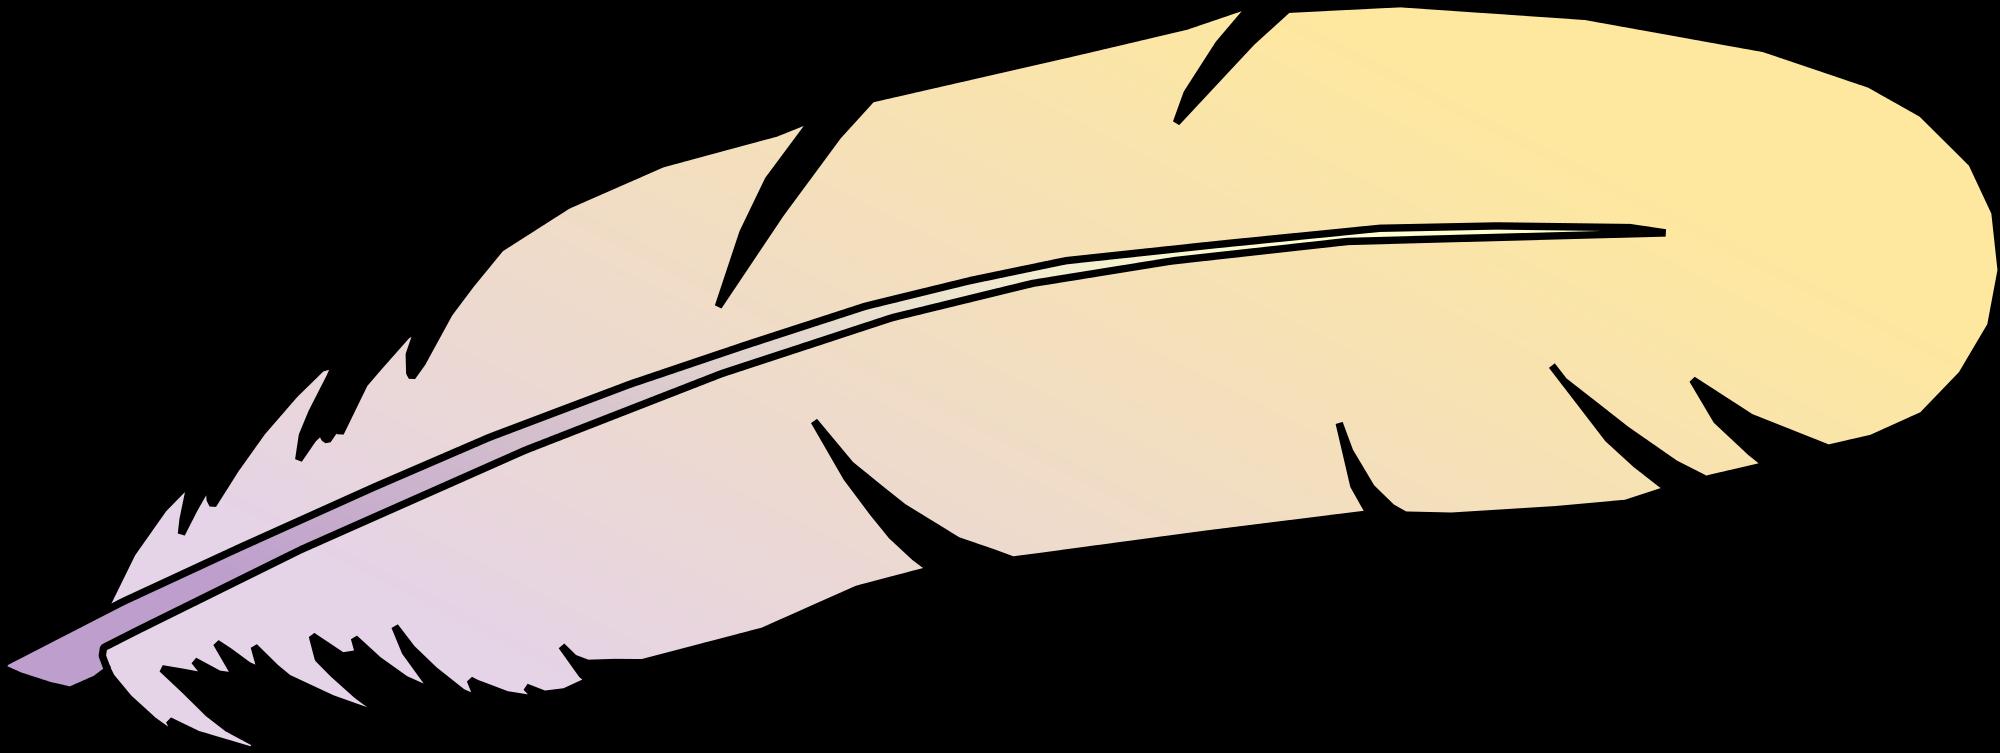 2000x753 Clip Art Eagle Feather